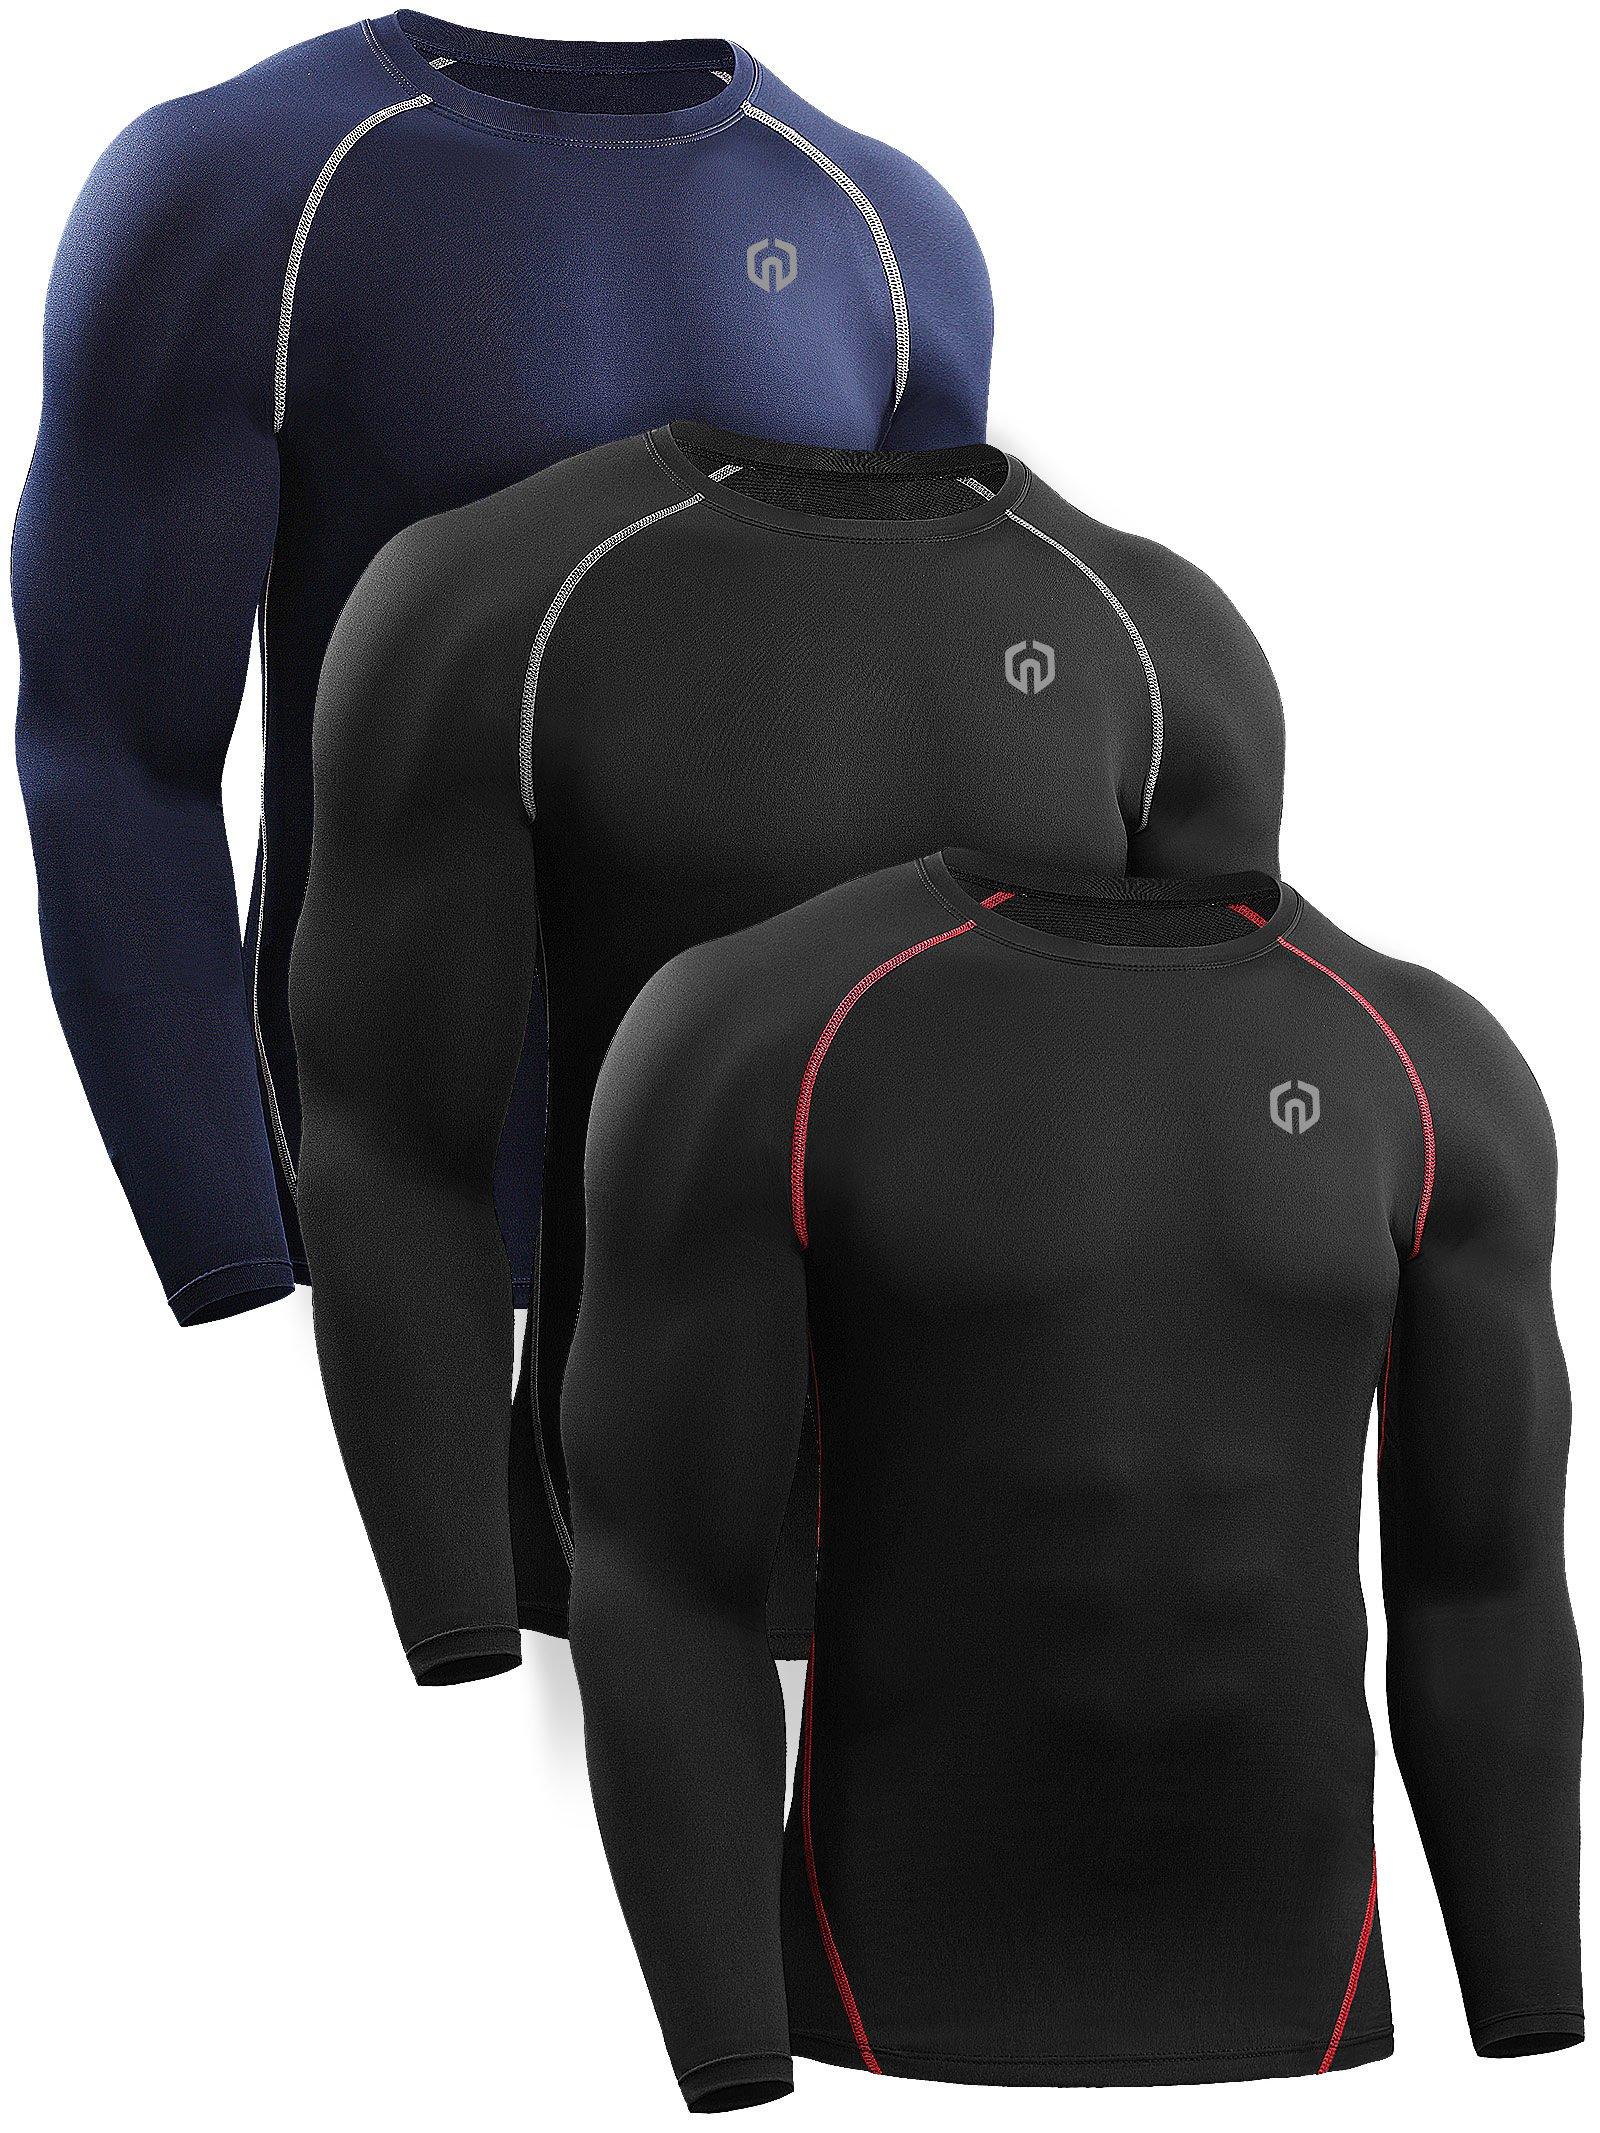 Neleus Men's 3 Pack Workout Compression Long Sleeve Shirts,5035,Black(Red),Black(Grey),Navy Blue,US S,EU M